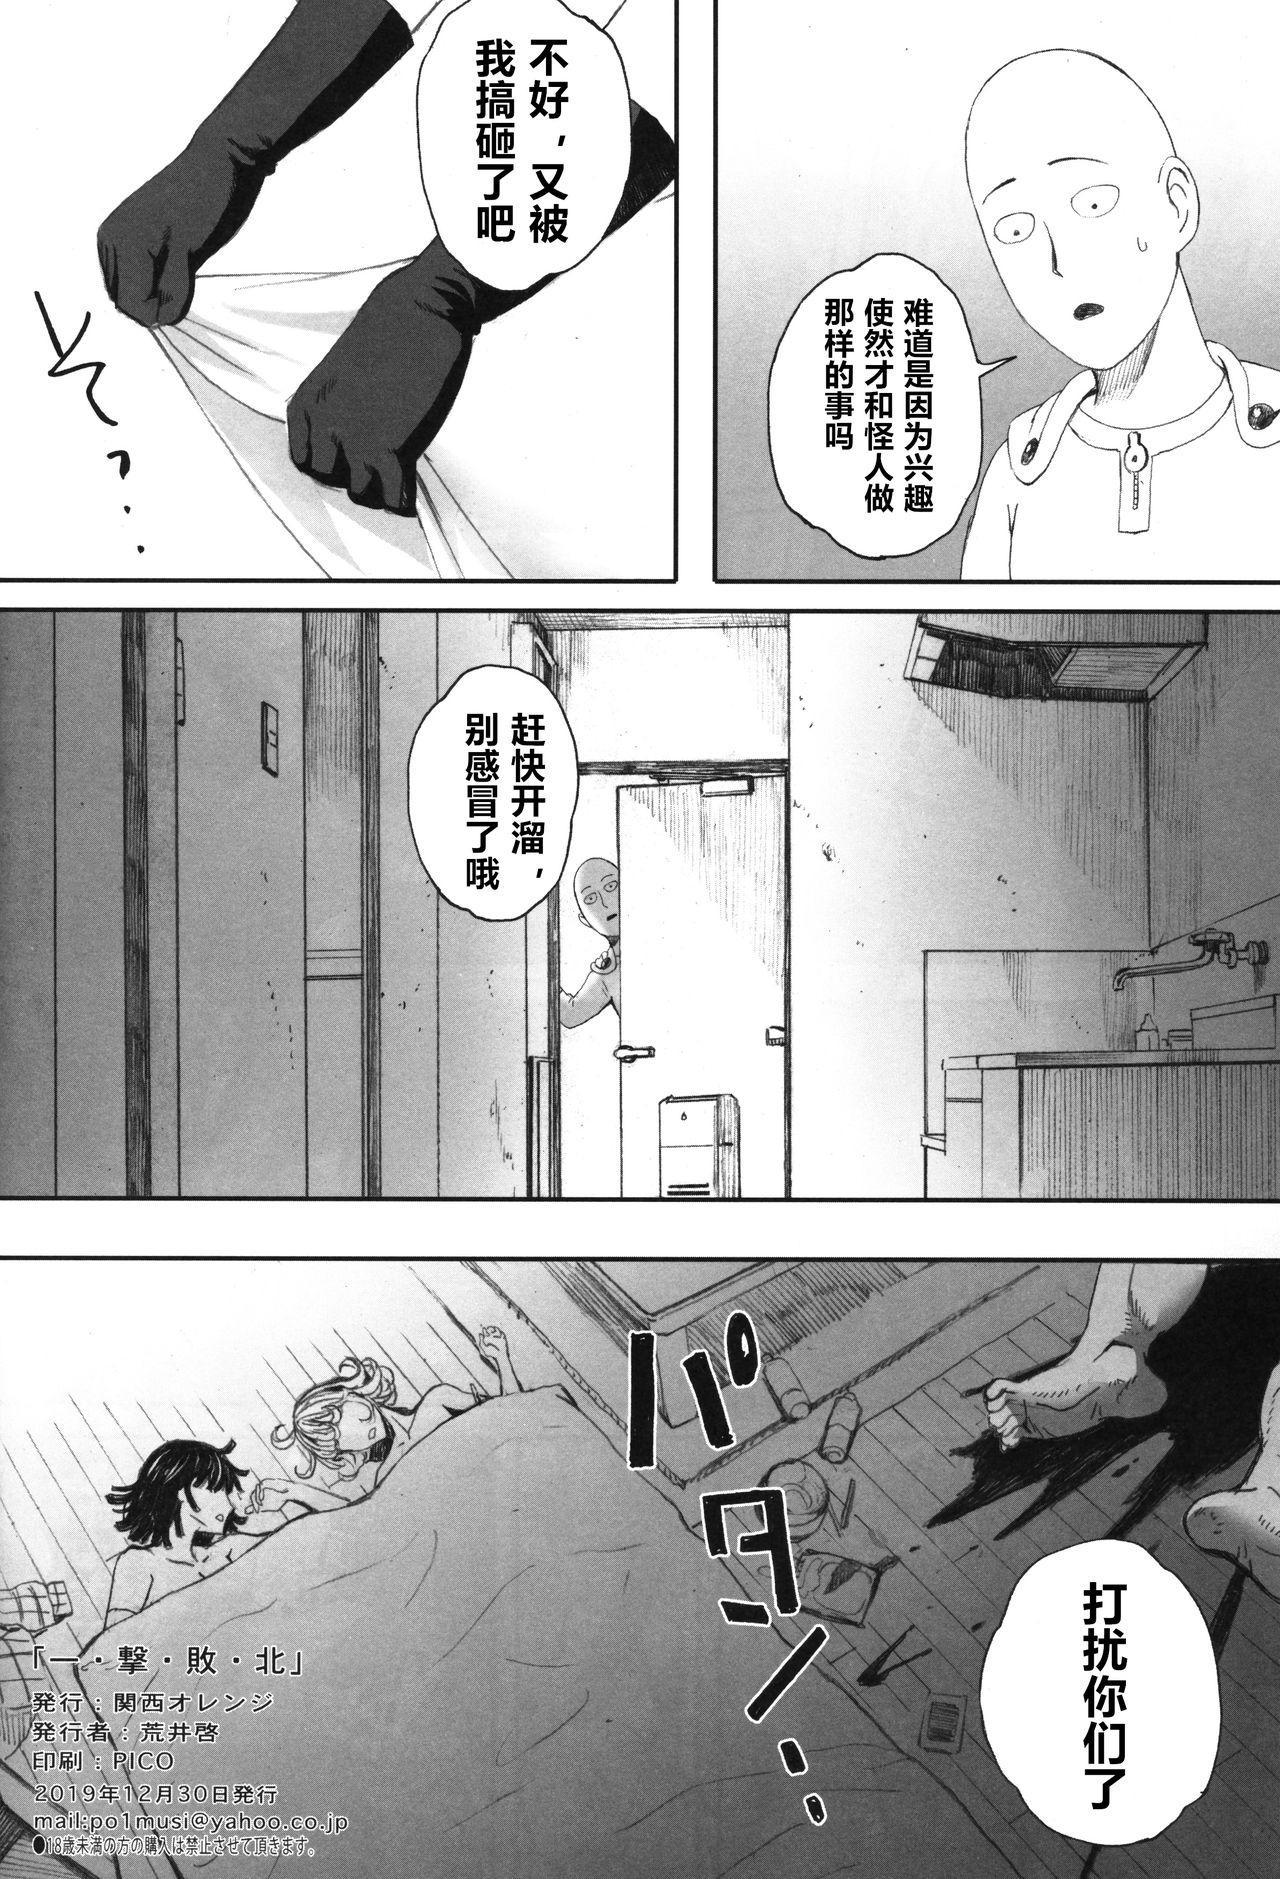 (C97) [Kansai Orange (Arai Kei)] Ichigeki Haiboku (One Punch Man)(chinese) 28